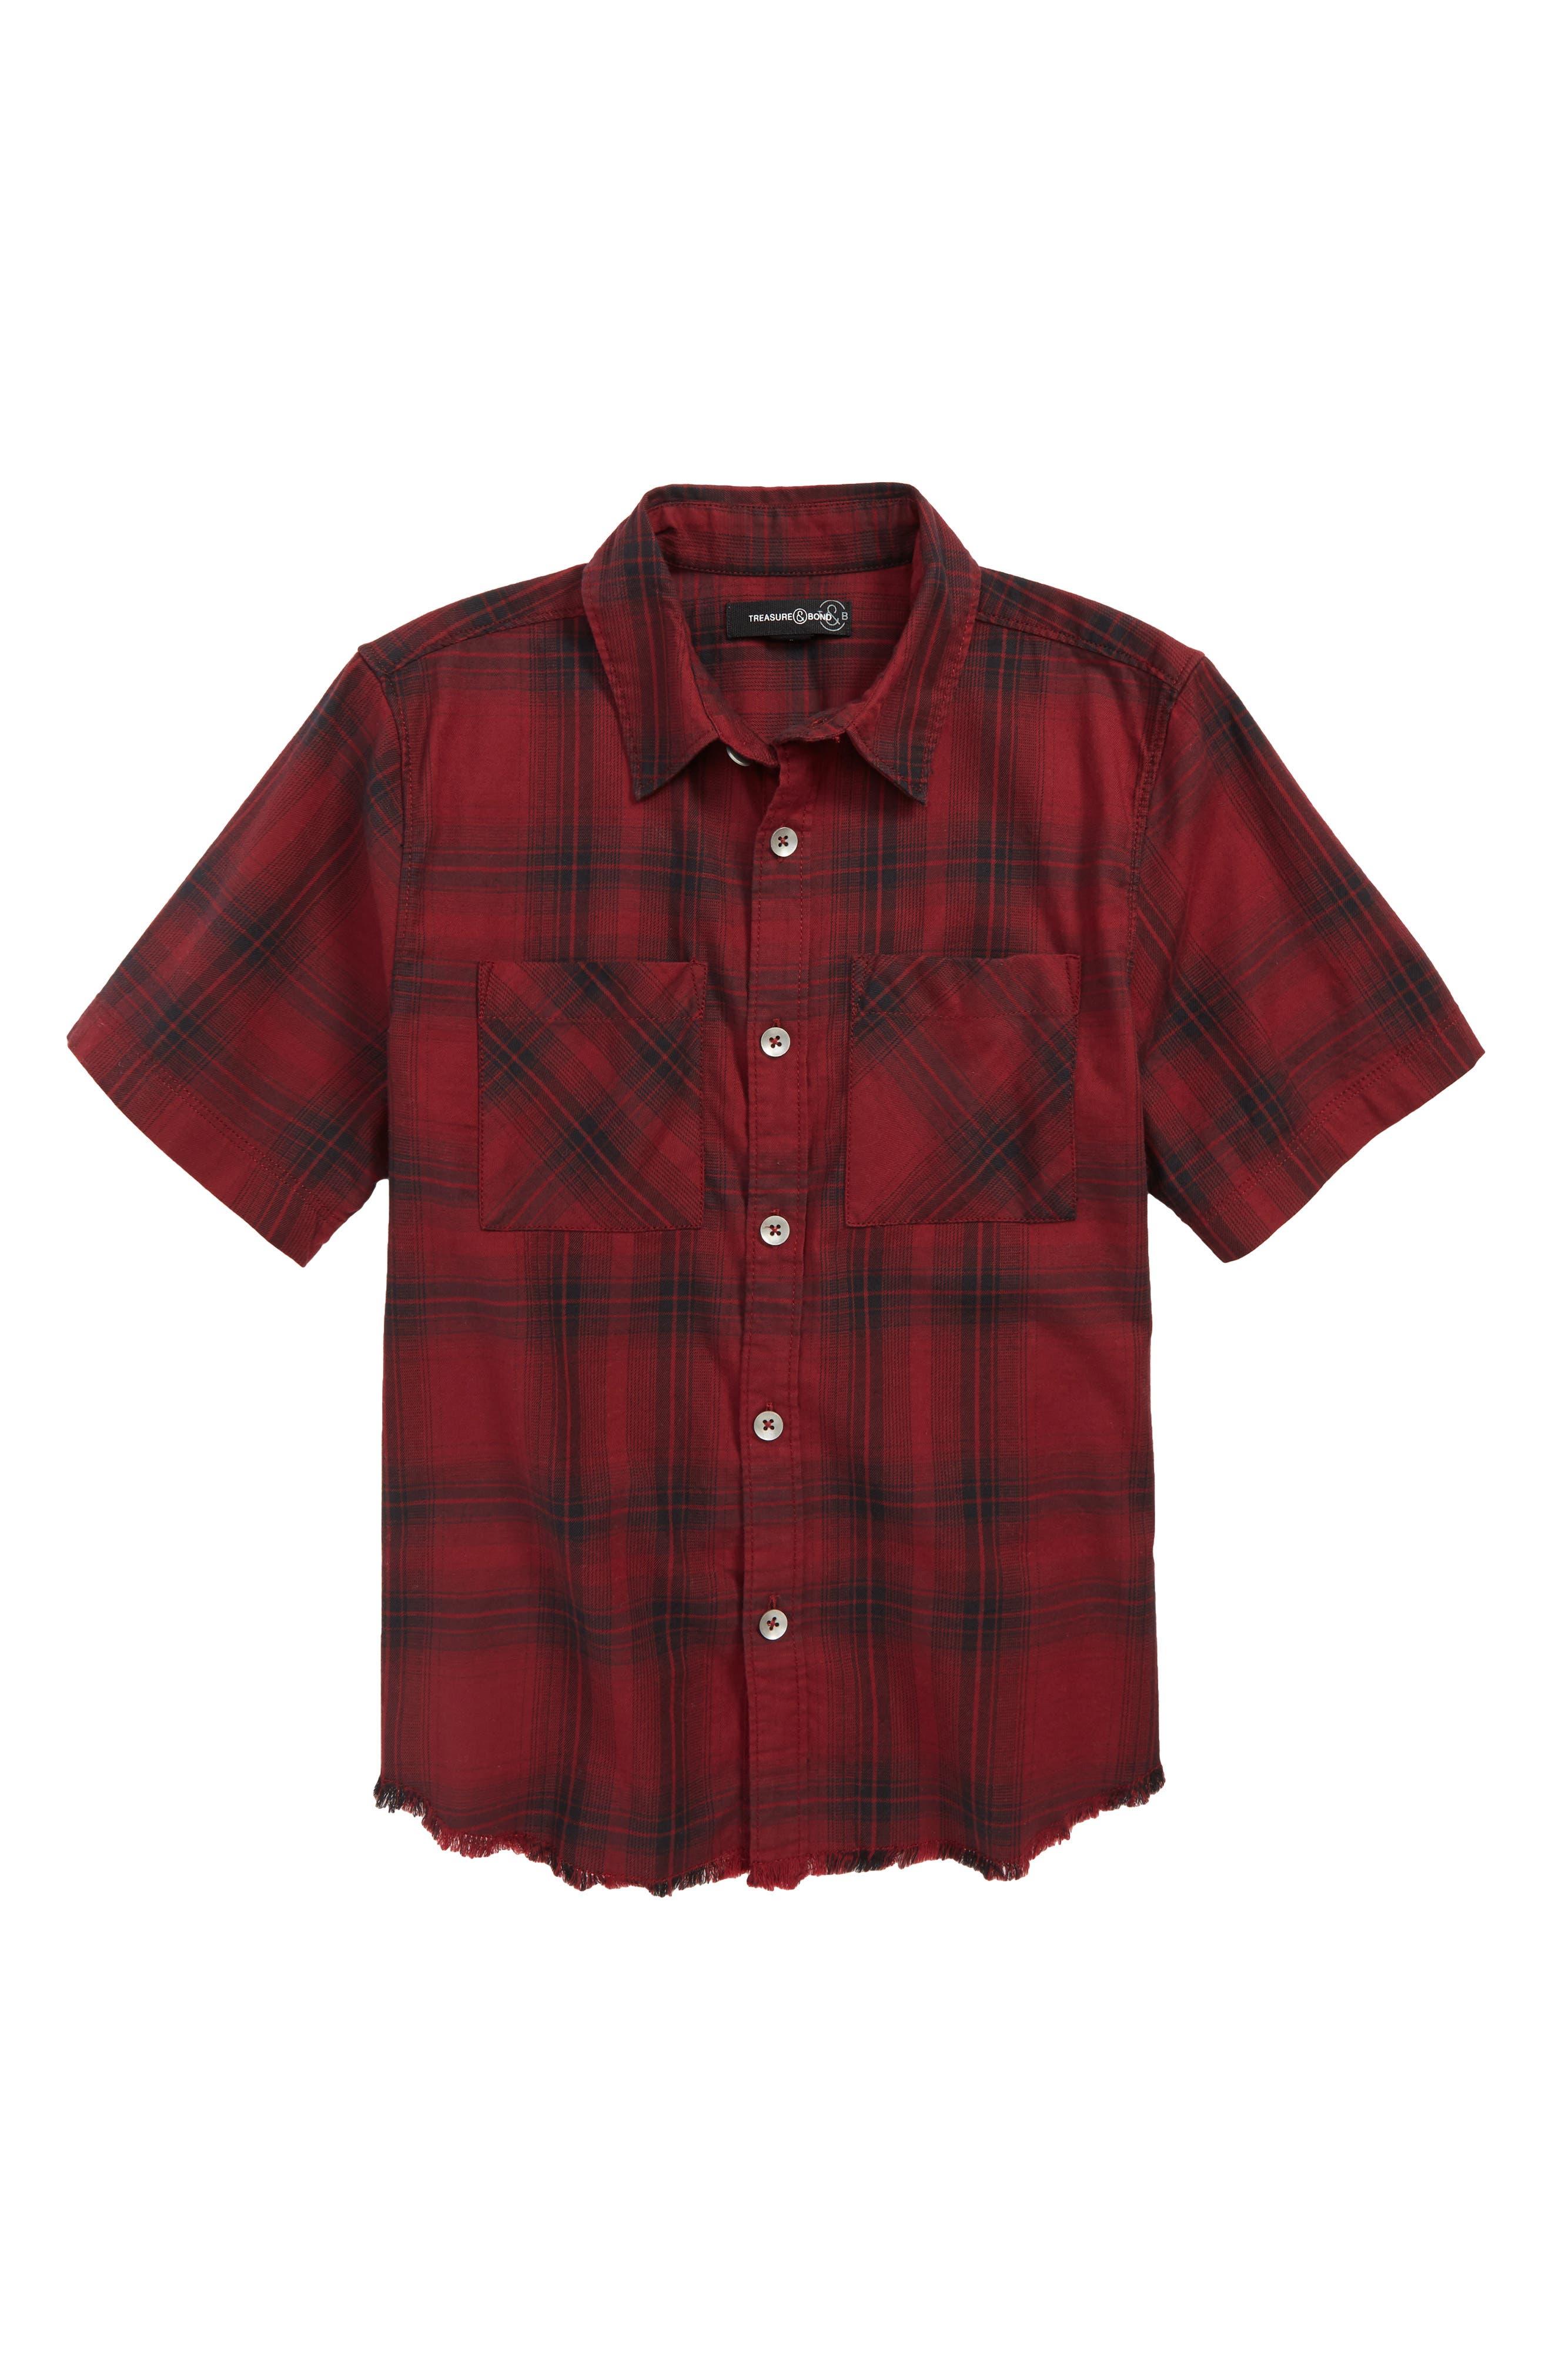 Distressed Plaid Flannel Shirt,                         Main,                         color, RED GRAPE- BLACK PLAID